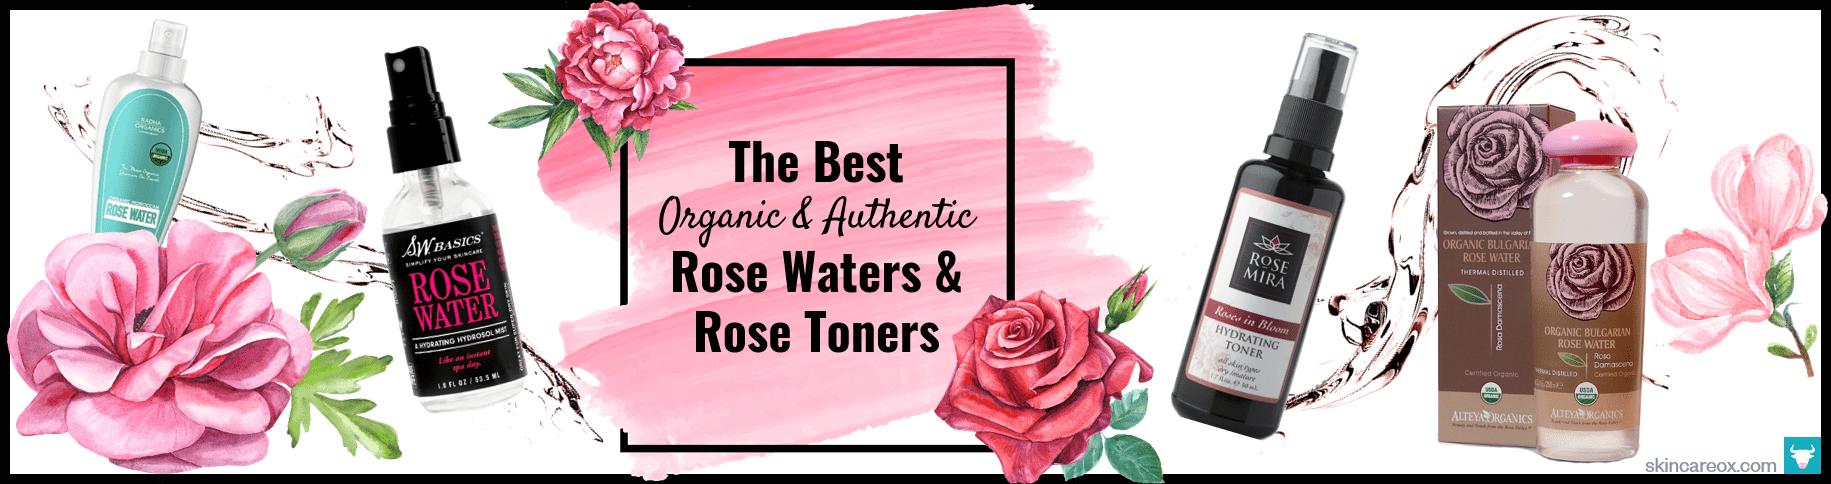 Organic Flowers Damask Rose Petal Mist by Whamisa #14